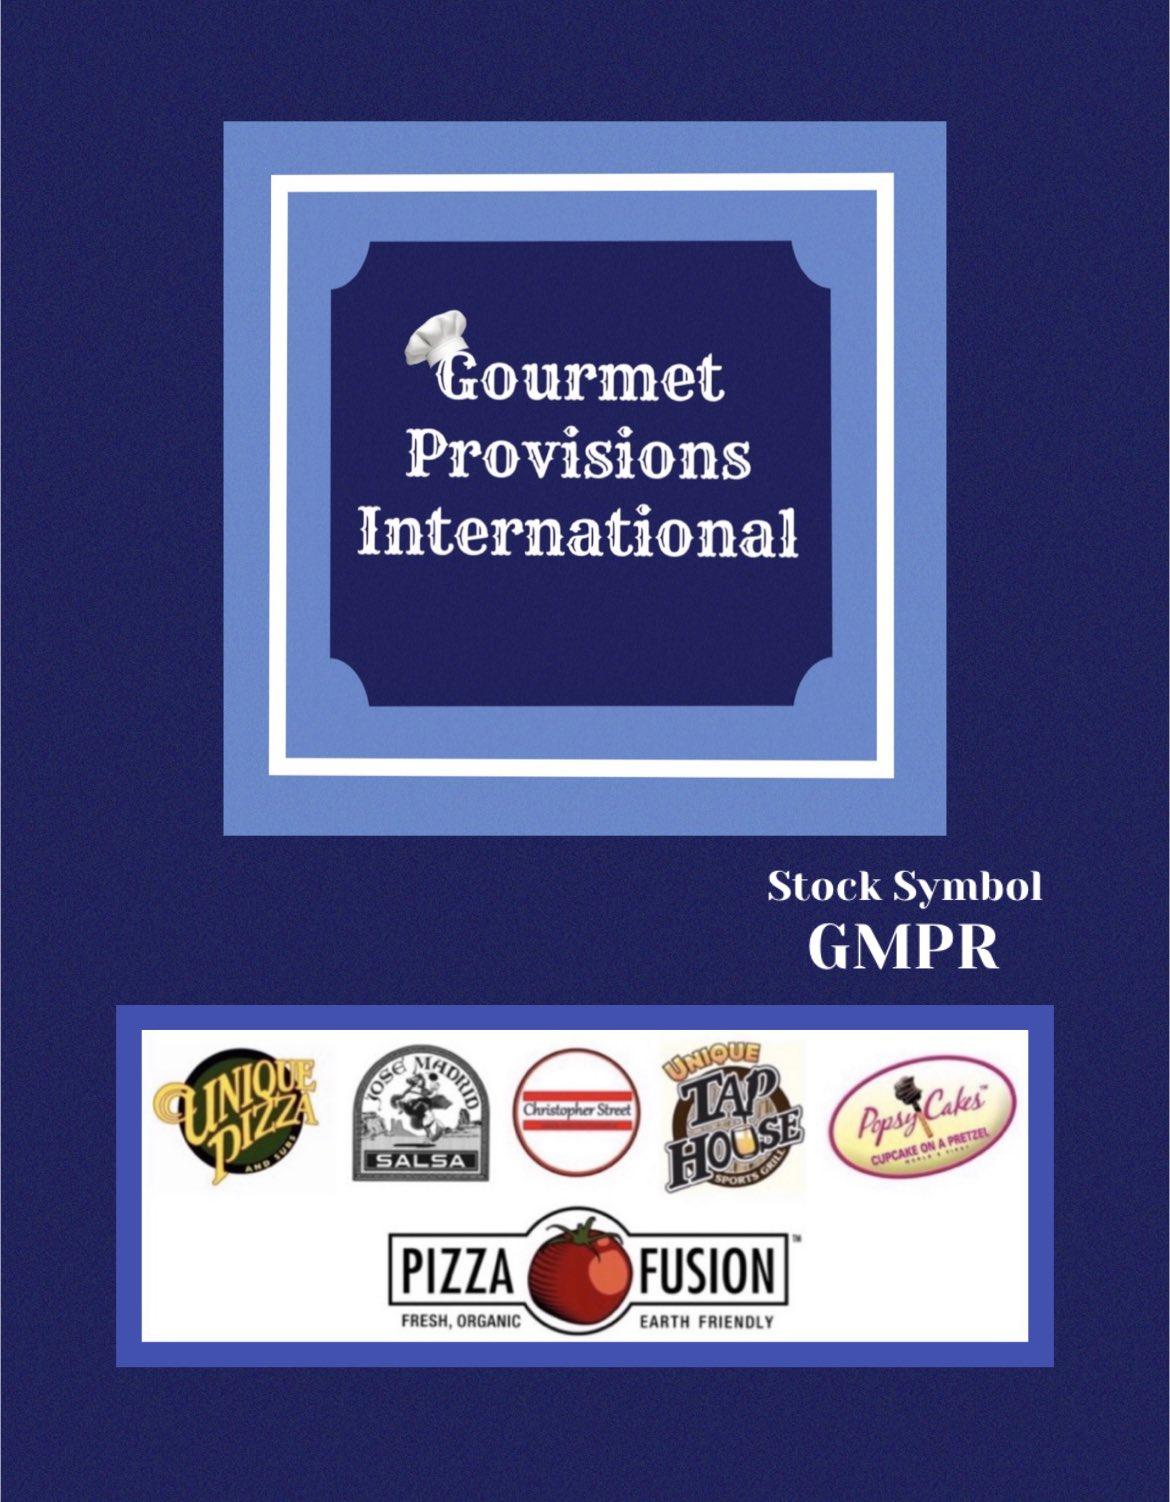 Gourmet Provisions International Corp.